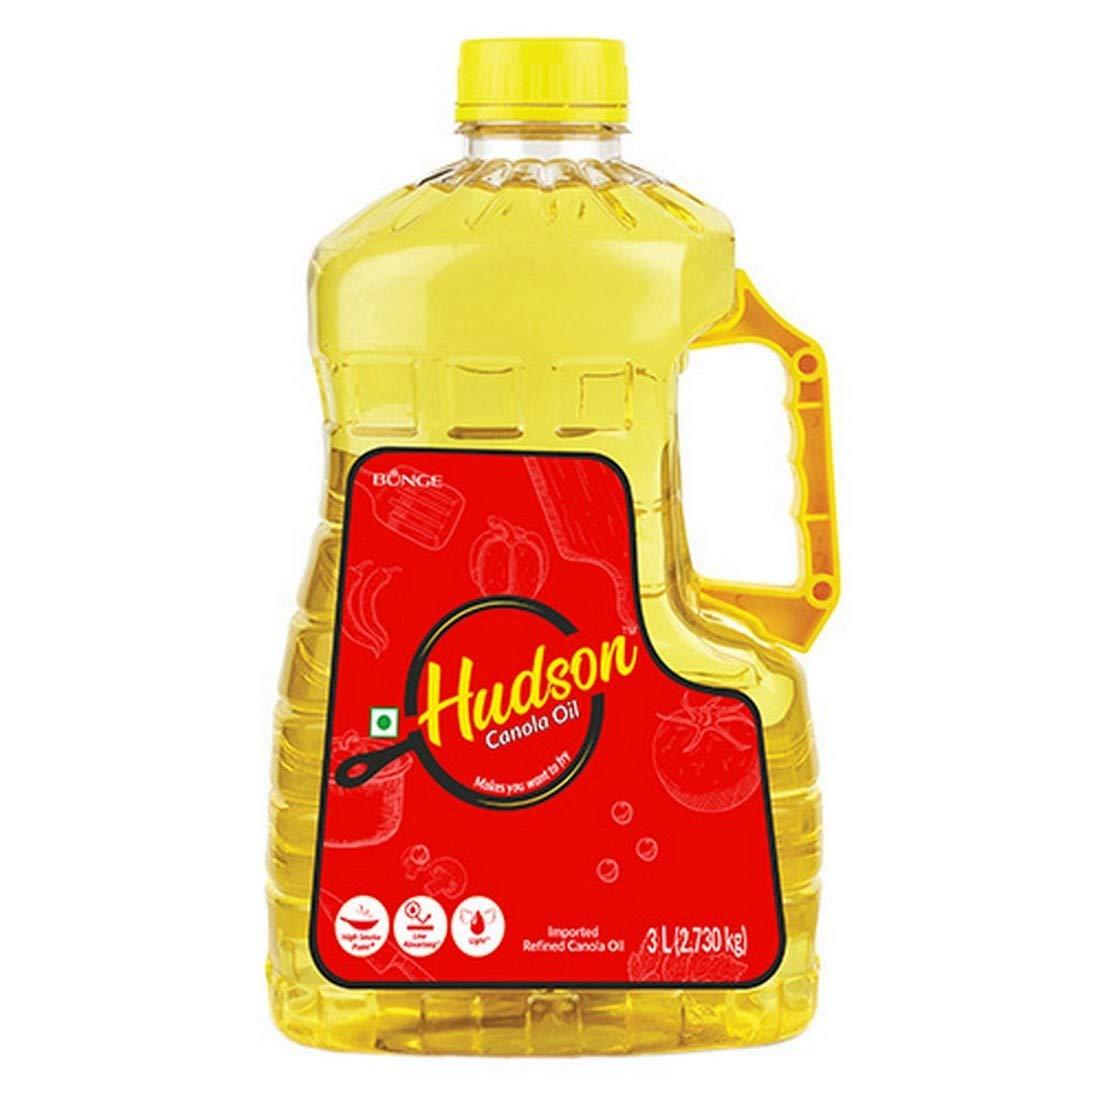 Hudson Canola Oil, 3L